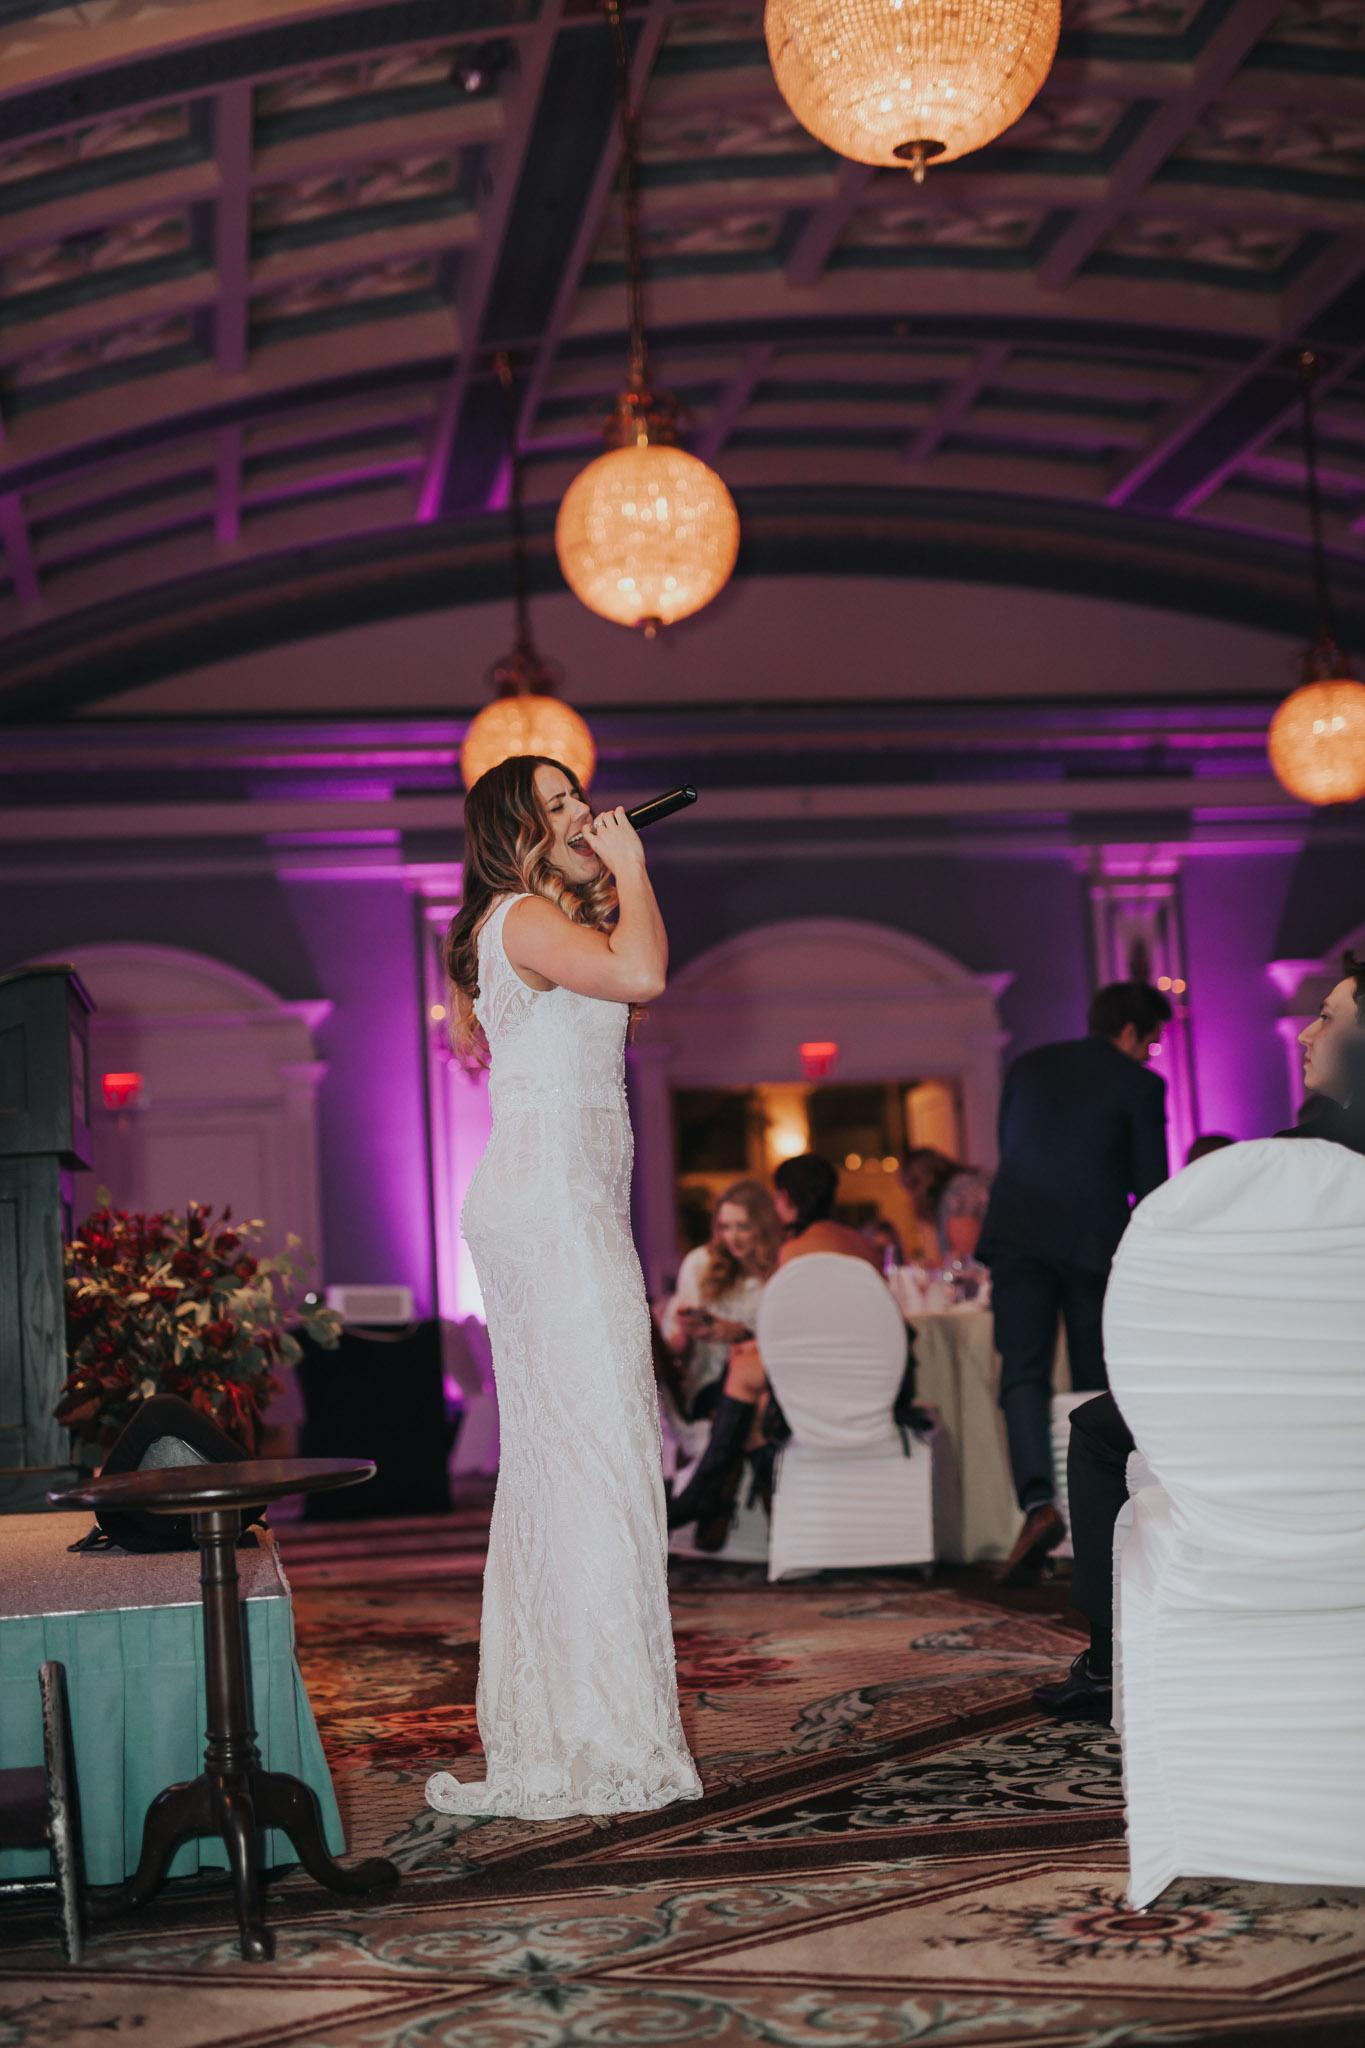 Eva of Beauty Bride serenades guests at the 2016 Vancouver Island Wedding Awards